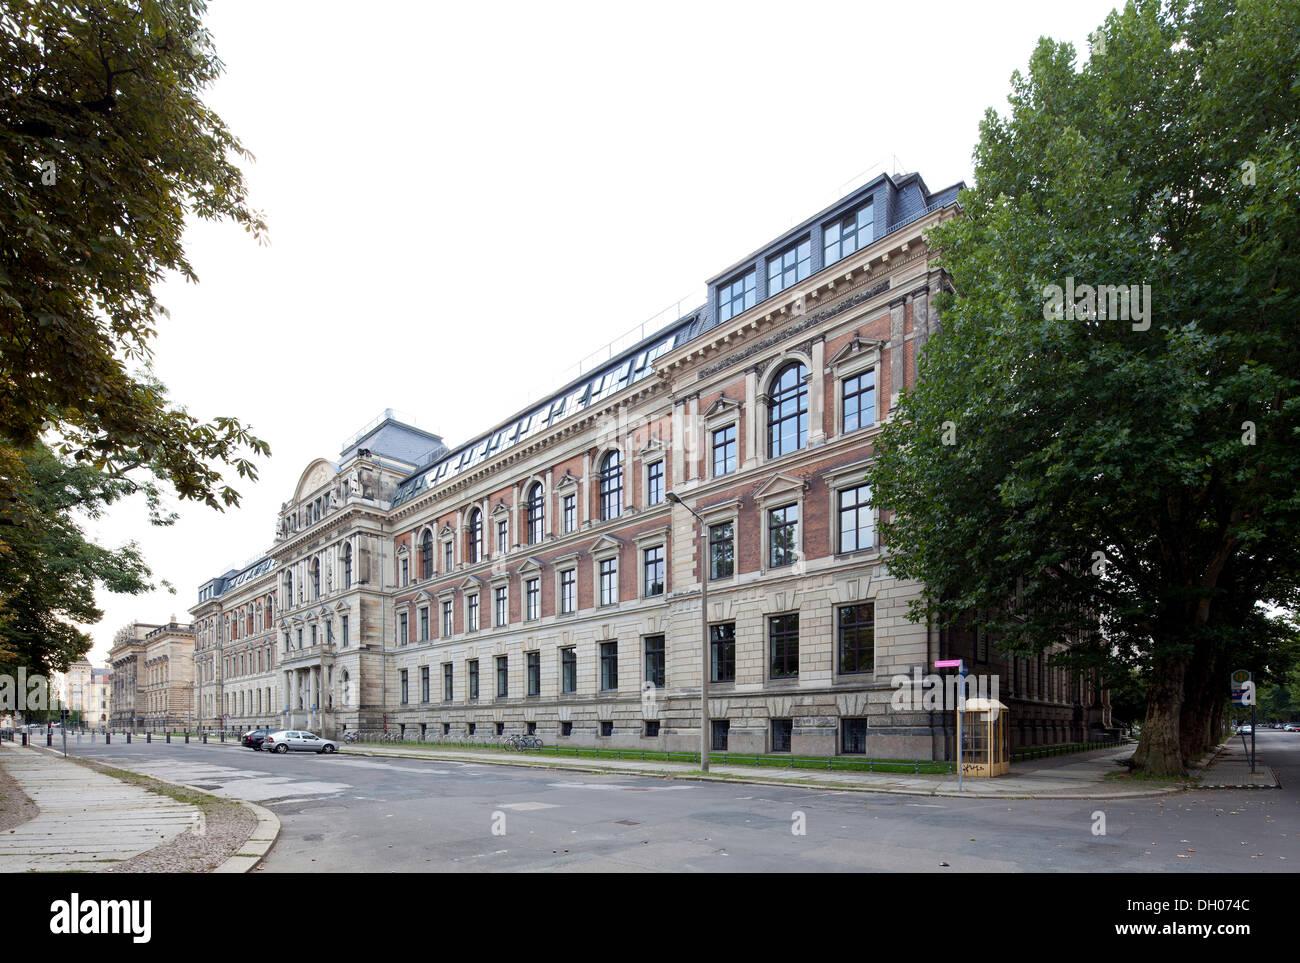 Academia de Artes Visuales, Leipzig, Sajonia, PublicGround Imagen De Stock